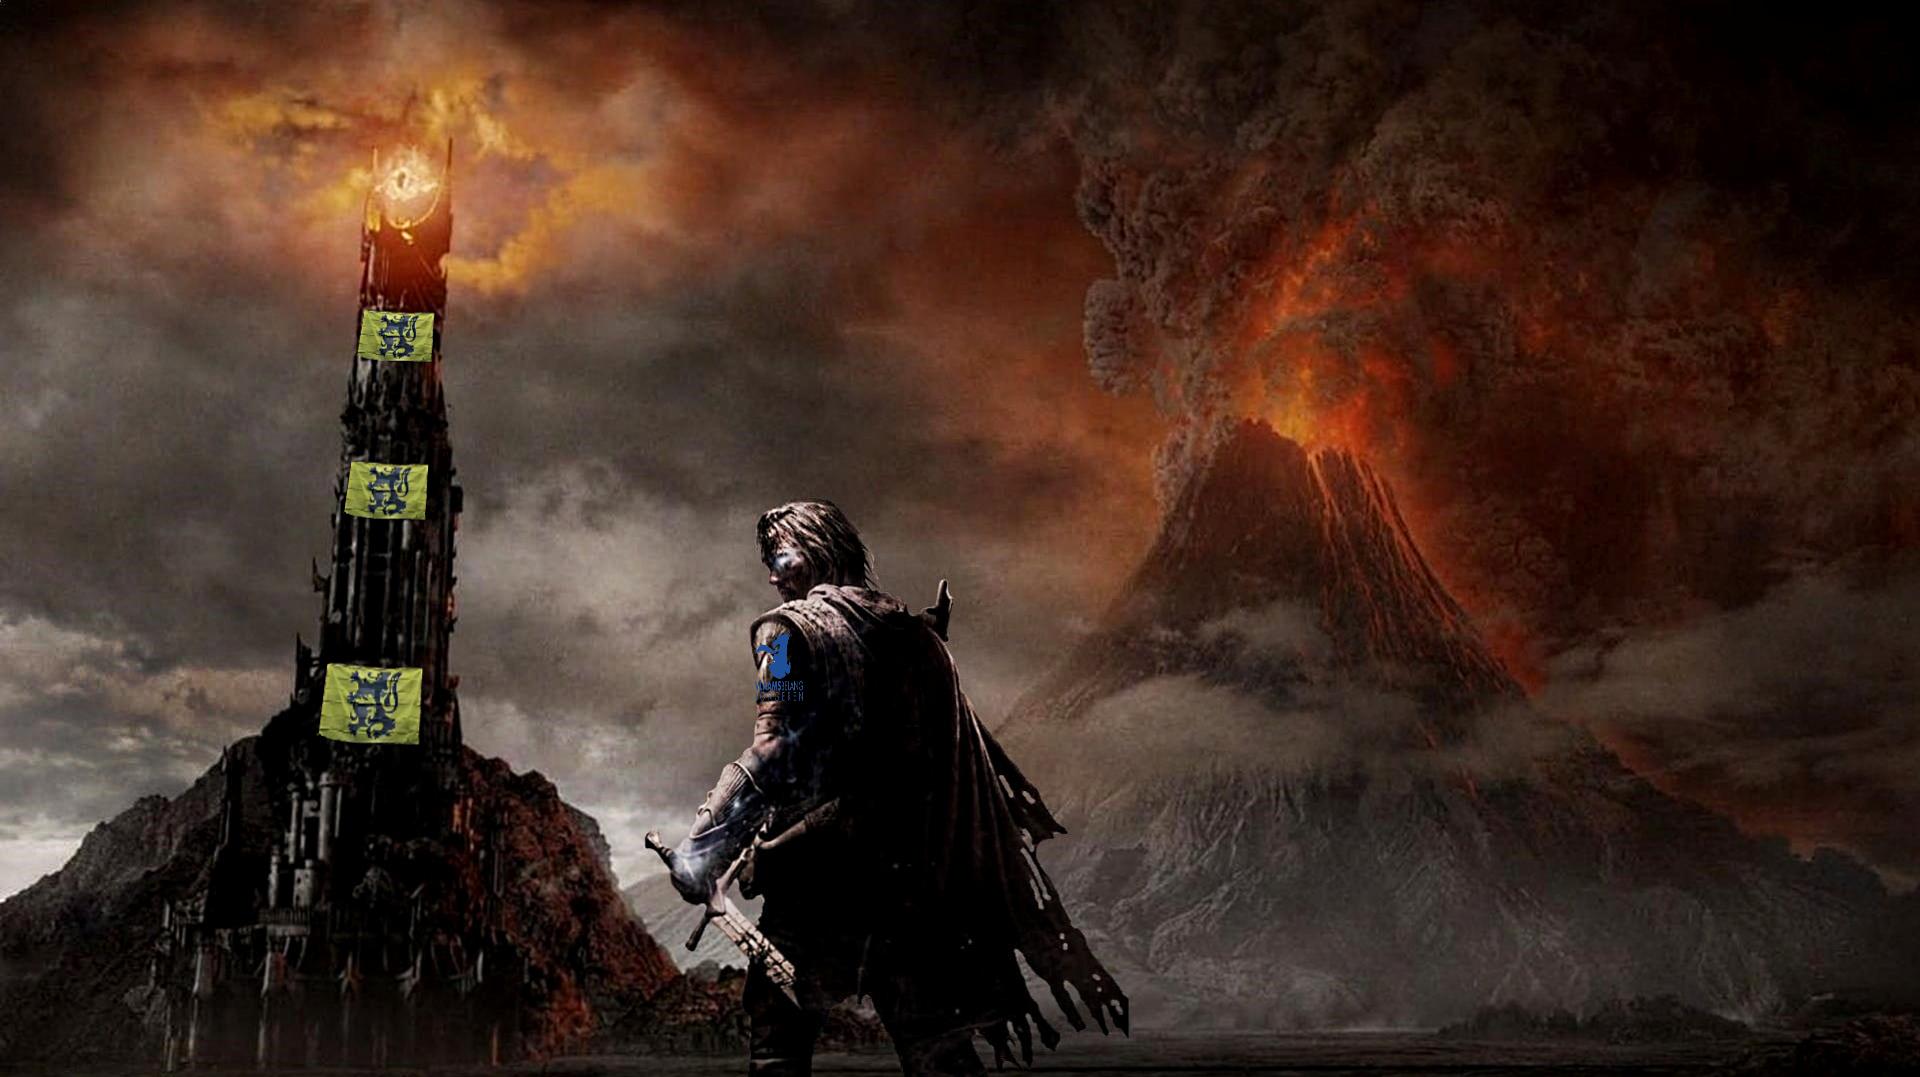 drapeau flamands-sauron-mountains-lava